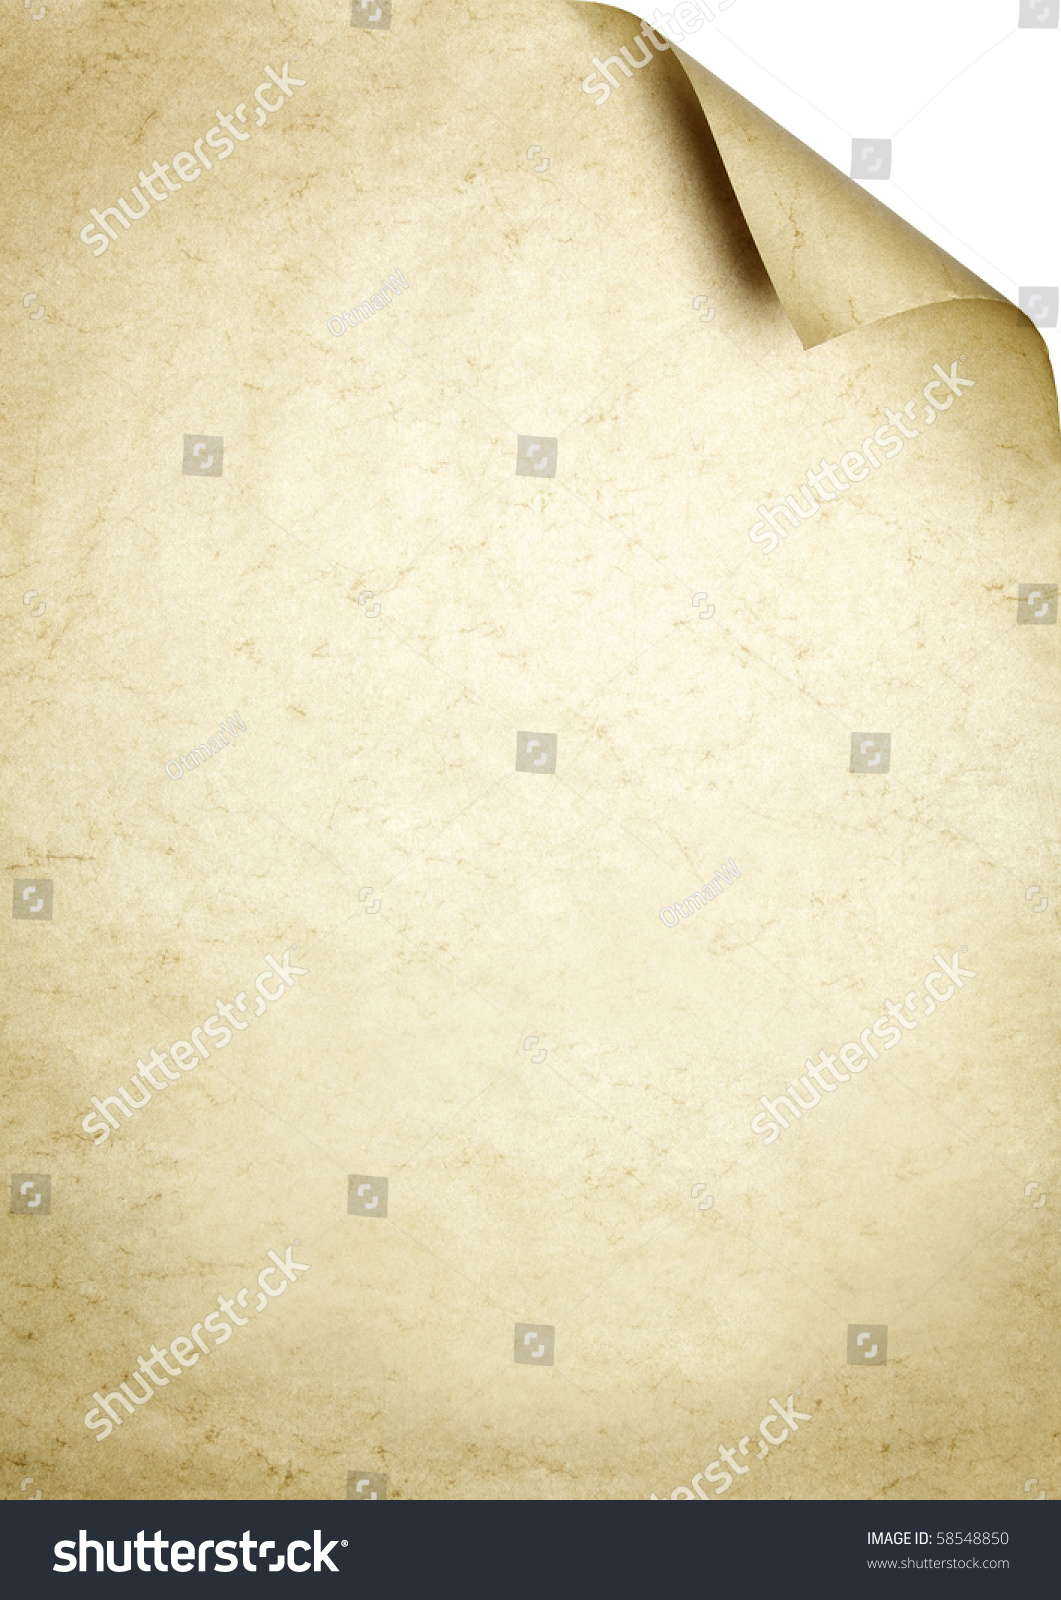 Brown writing paper